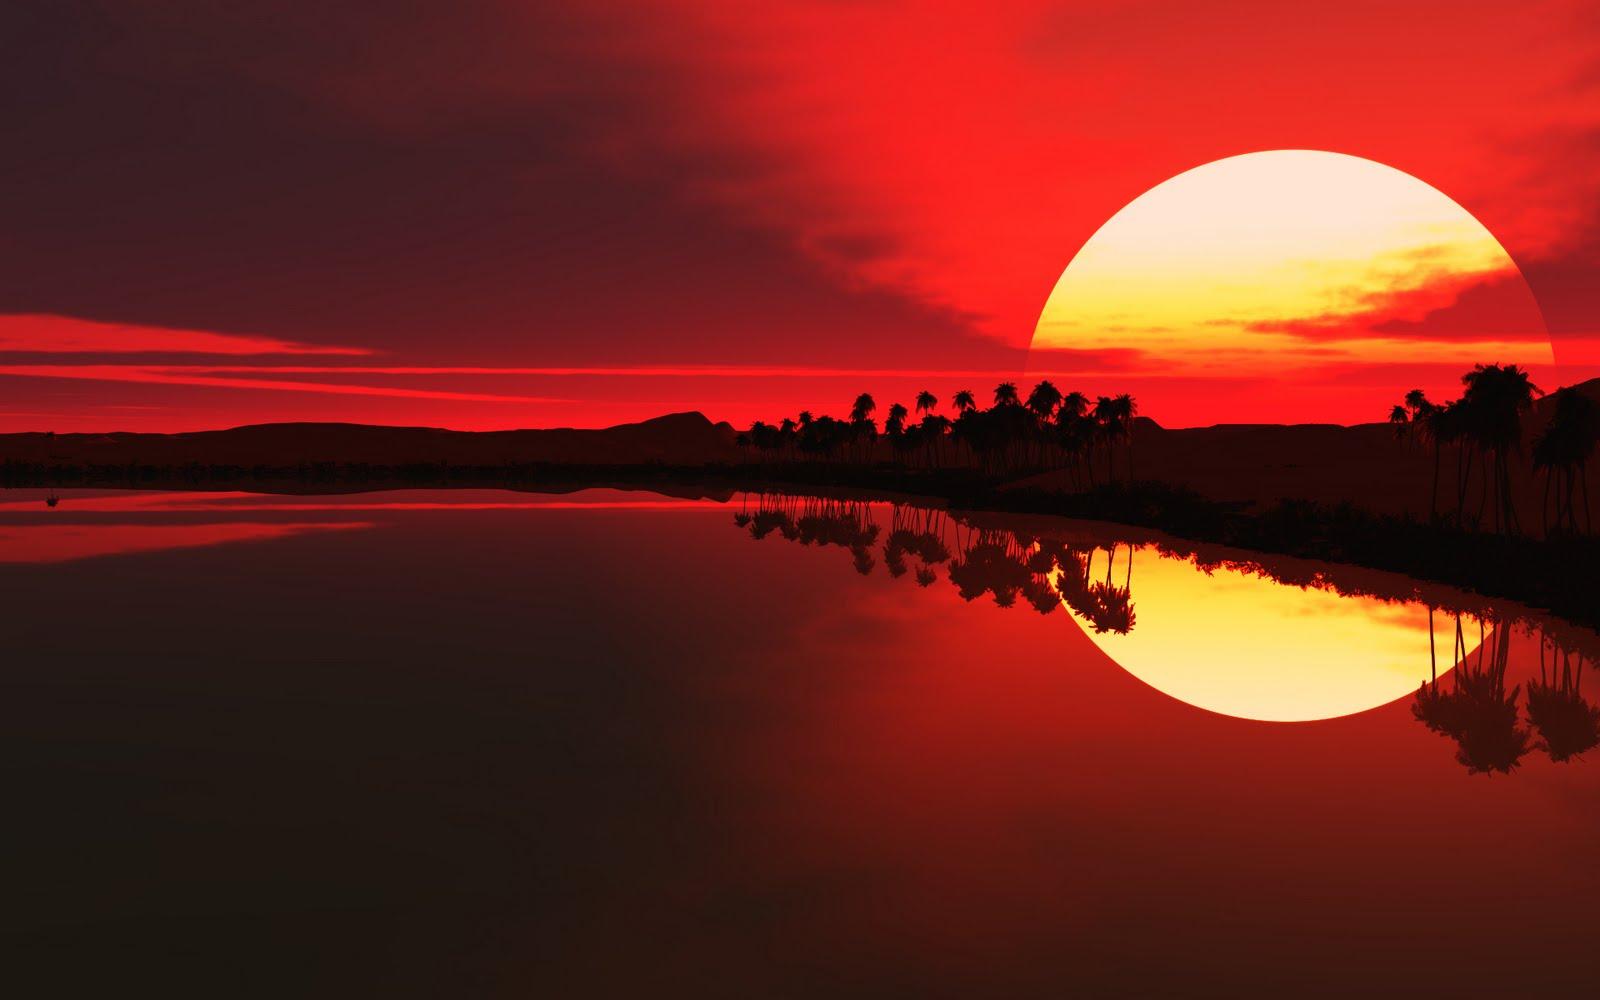 Beautiful Wallpapers For Desktop Beautiful Sunset Wallpapers 1600x1000